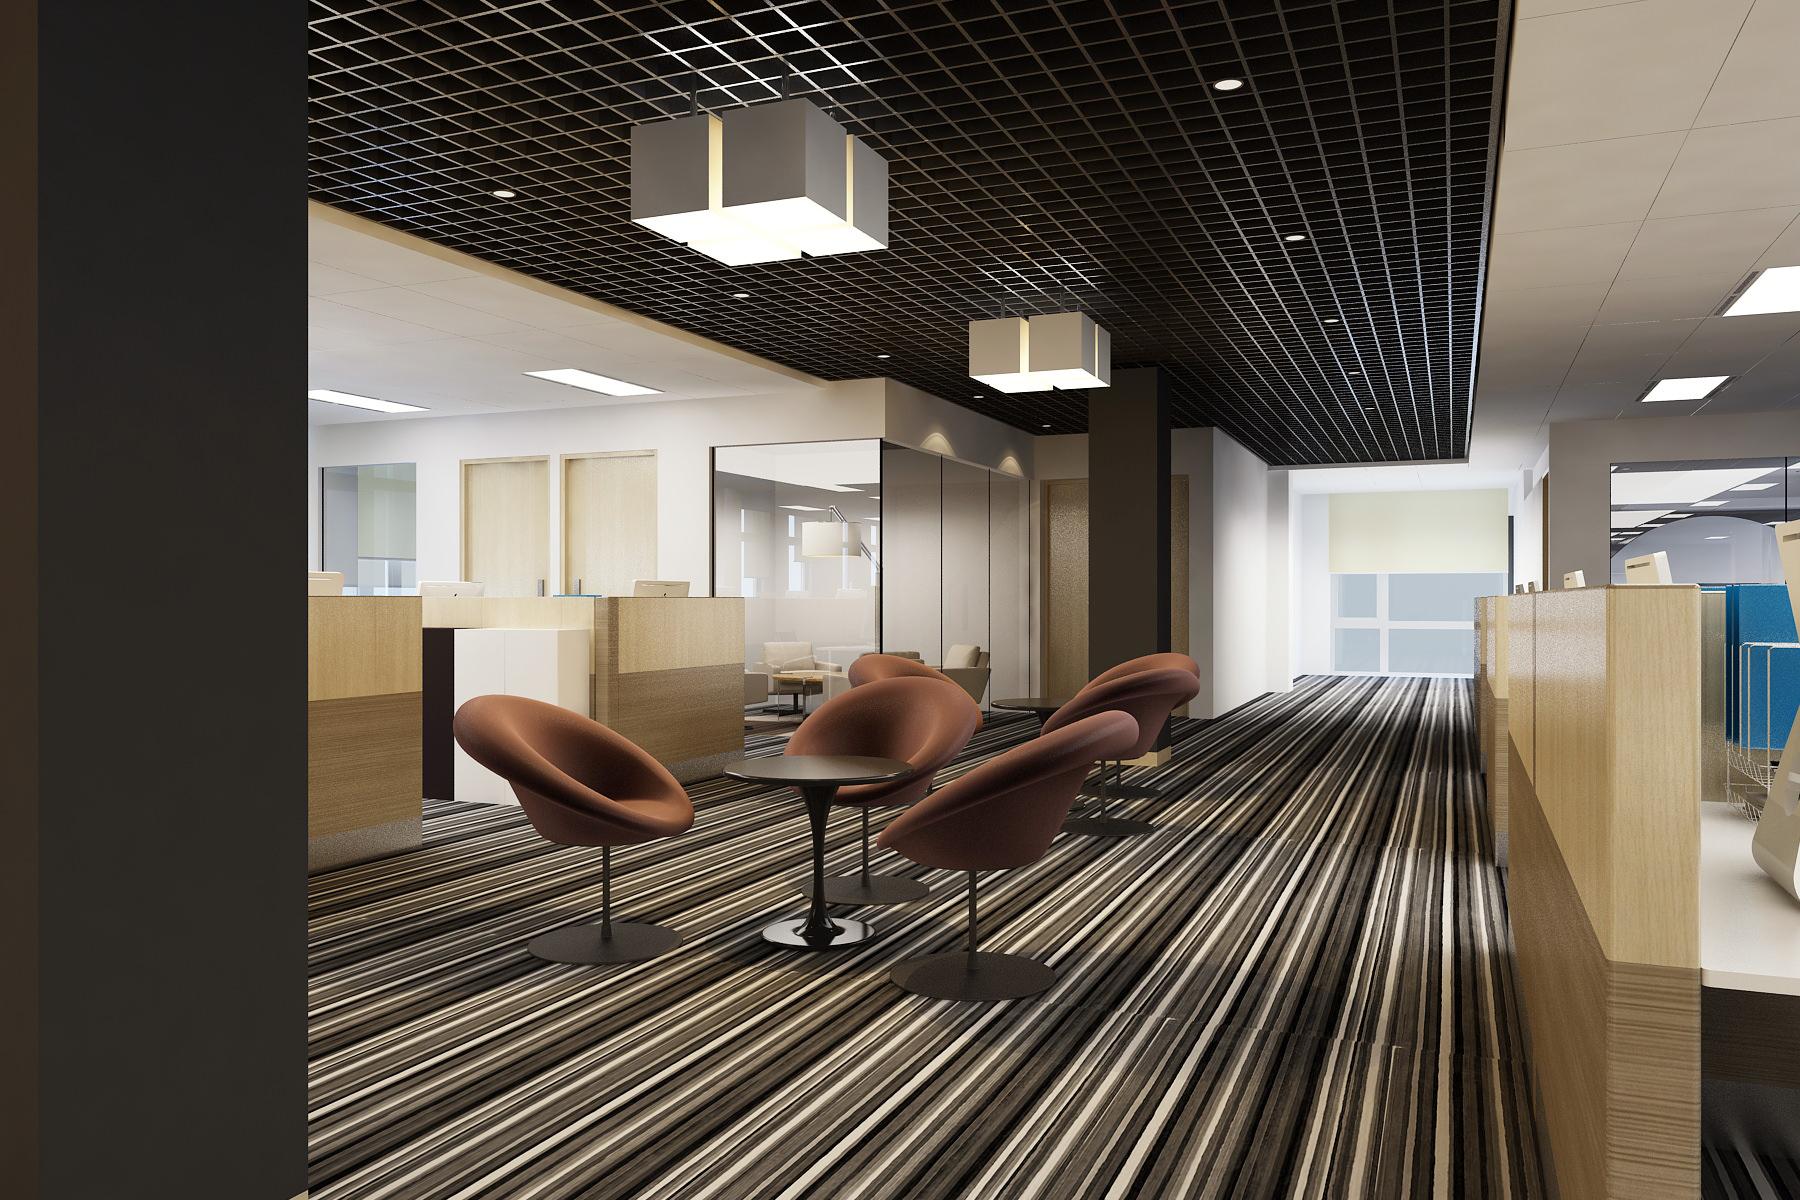 Detailed Office Building Interior Scenes 3d Model Max